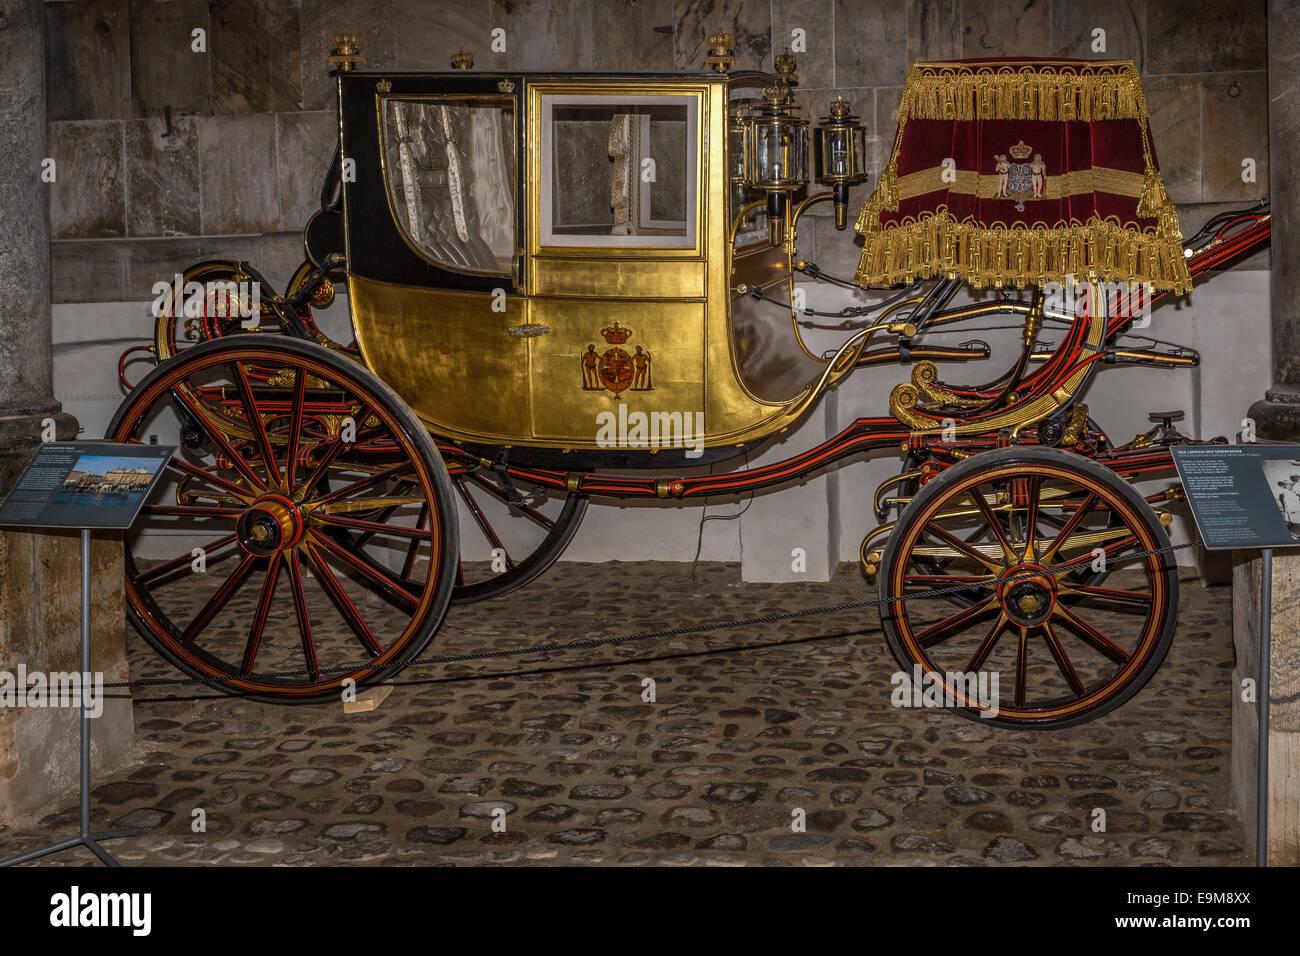 The Royal Gold Coach, Royal Stables, Christiansborg, Copenhagen, Denmark - Stock Image